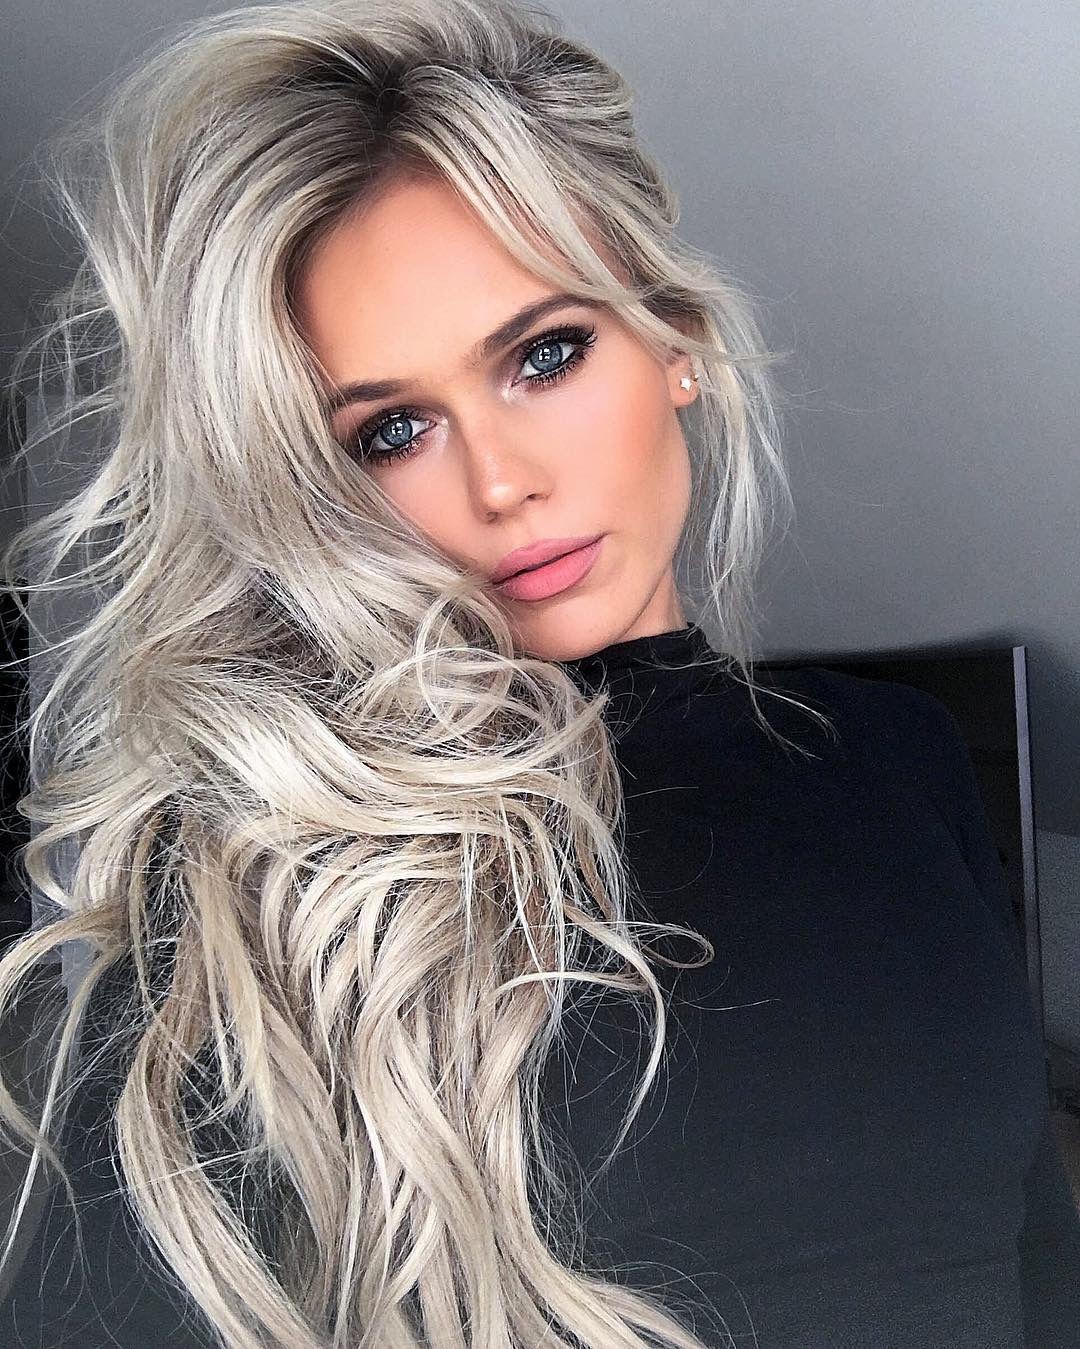 hilde osland sexy hair hairstyle sexy hair